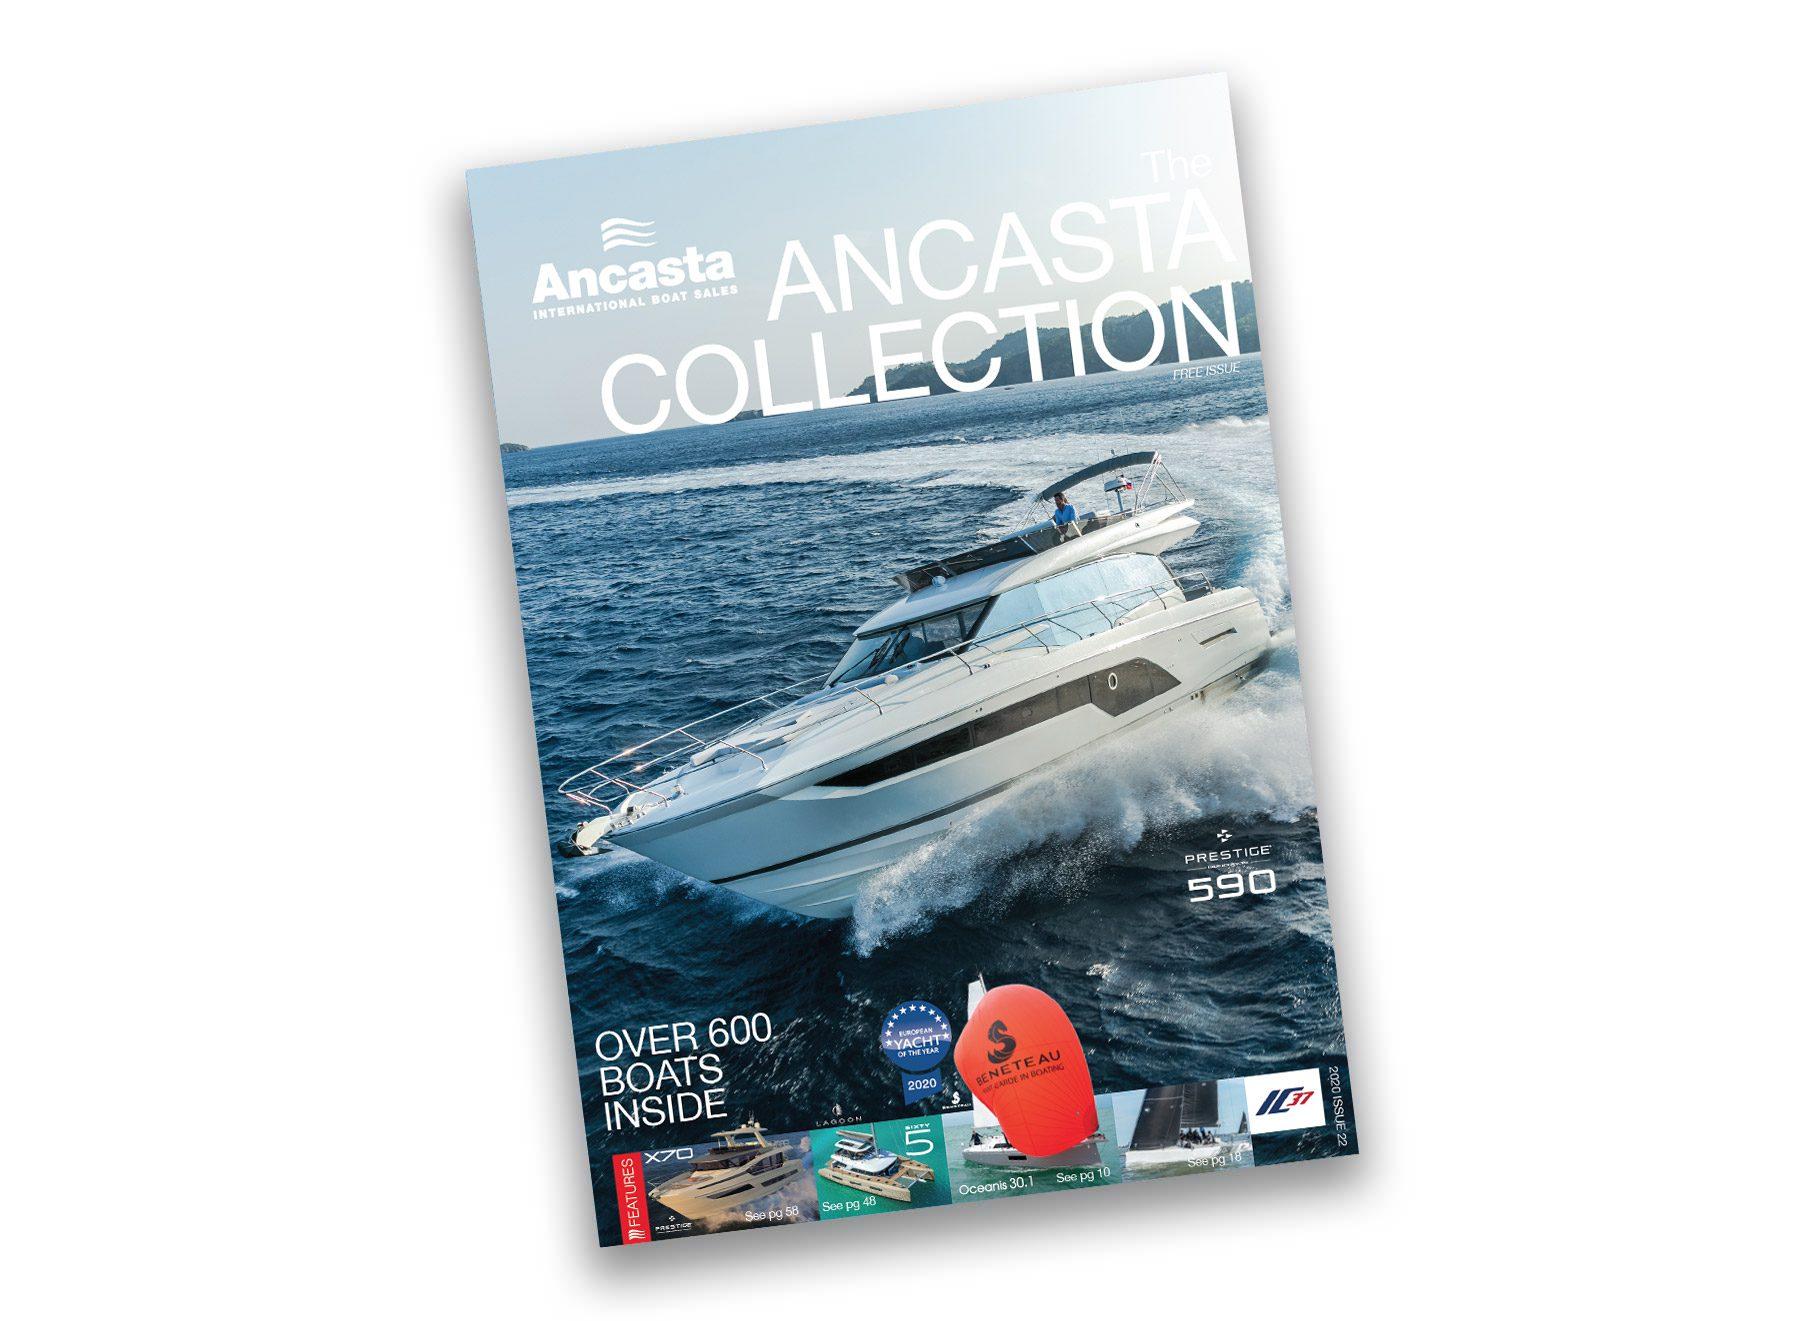 Ancasta collection magazine issue 22